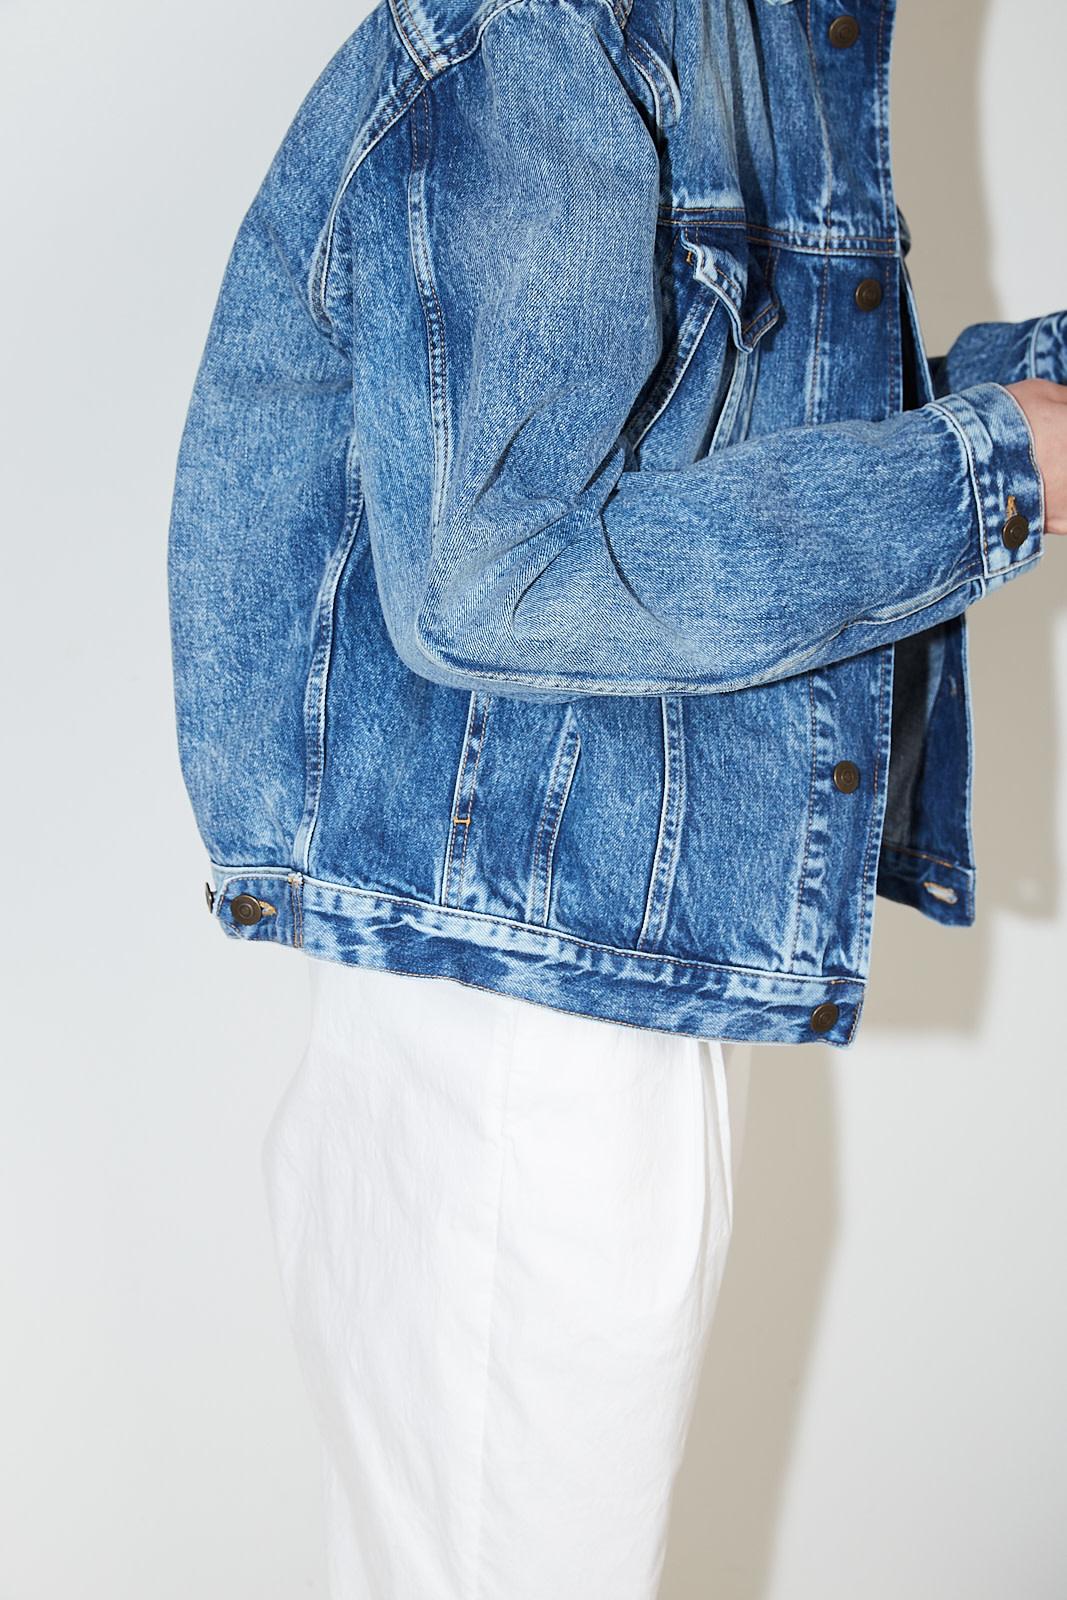 Maison Margiela - Jeans jacket MM